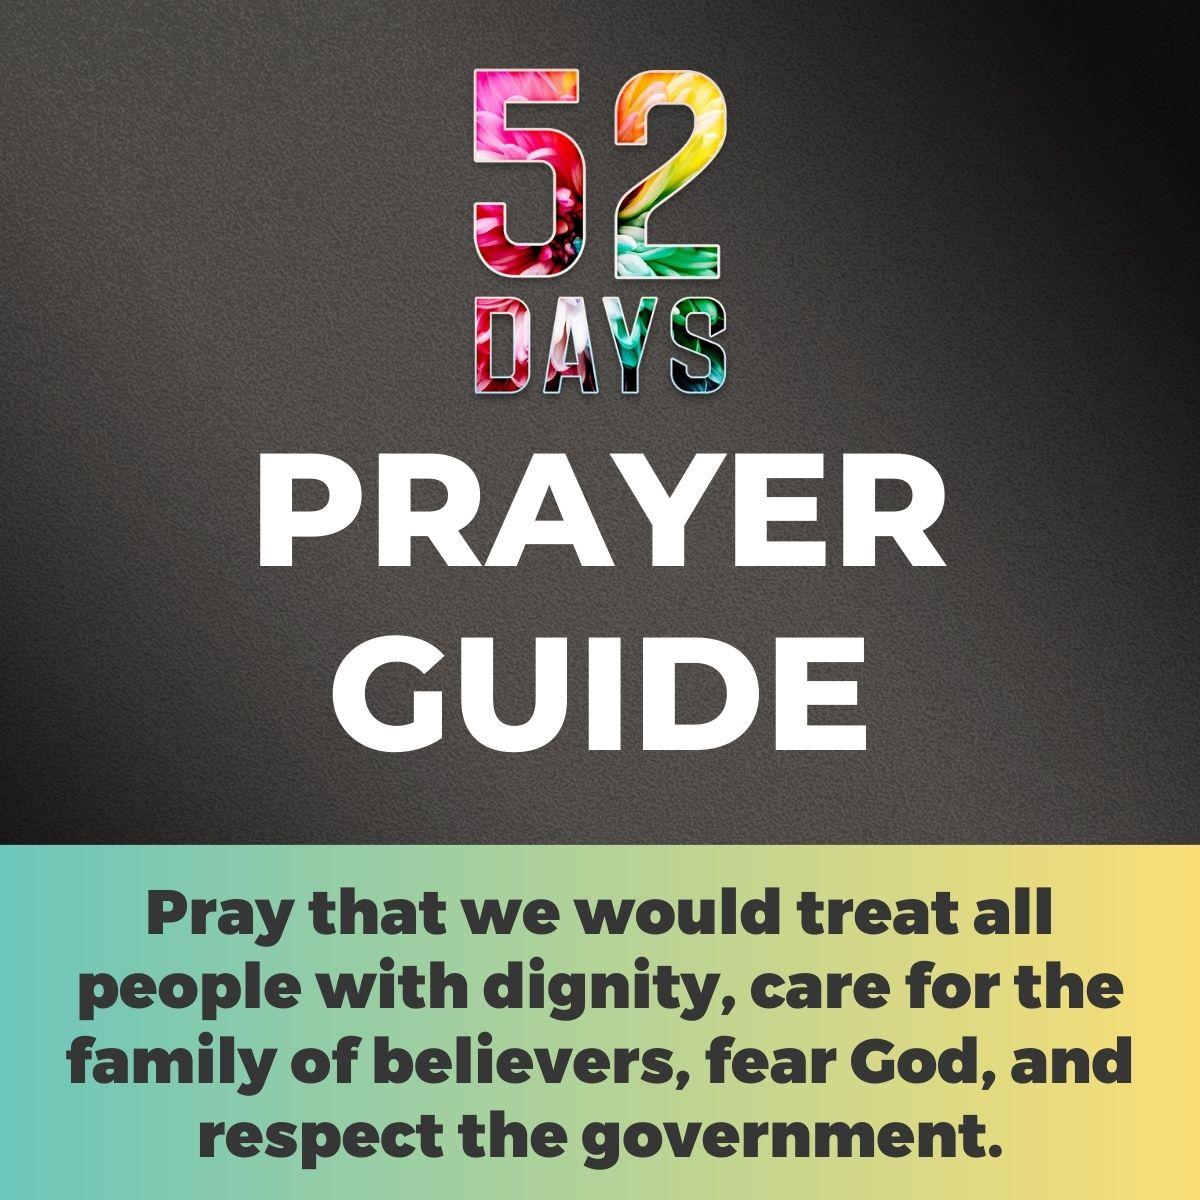 52_PrayerGuide_TILE_W5